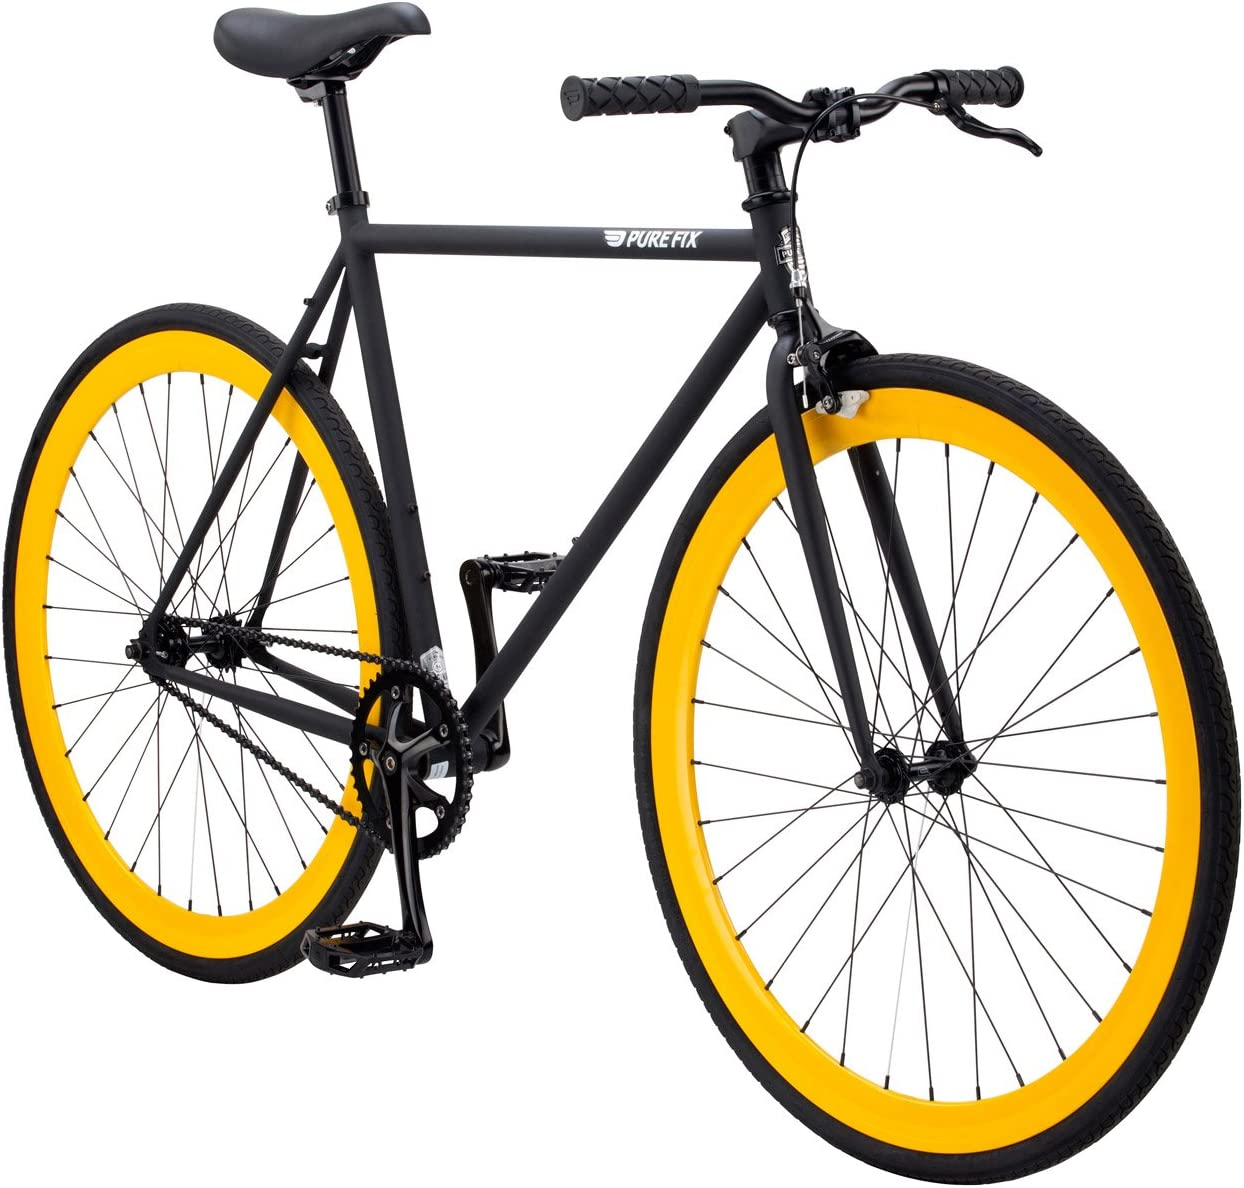 Pure-Fix-Fixed-Bike-Review